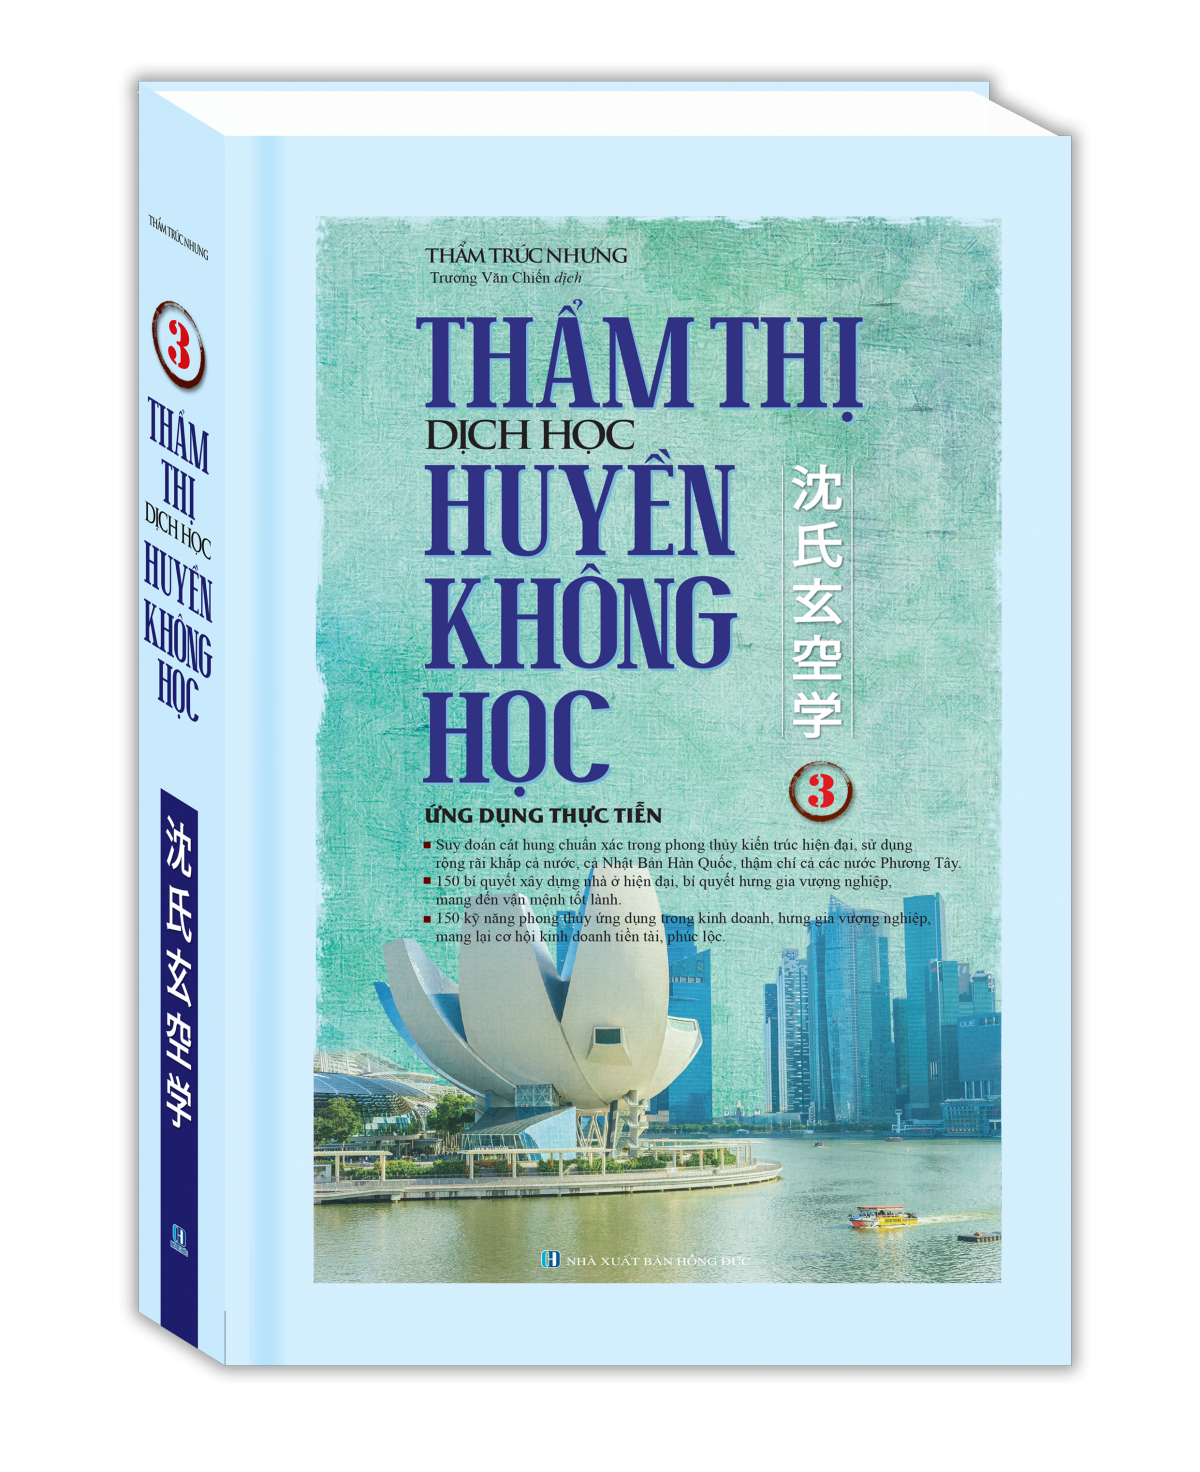 tham-thi-huyen-khong-hoc-tap-3-245k-1-.u5131.d20170405.t165707.375566.png